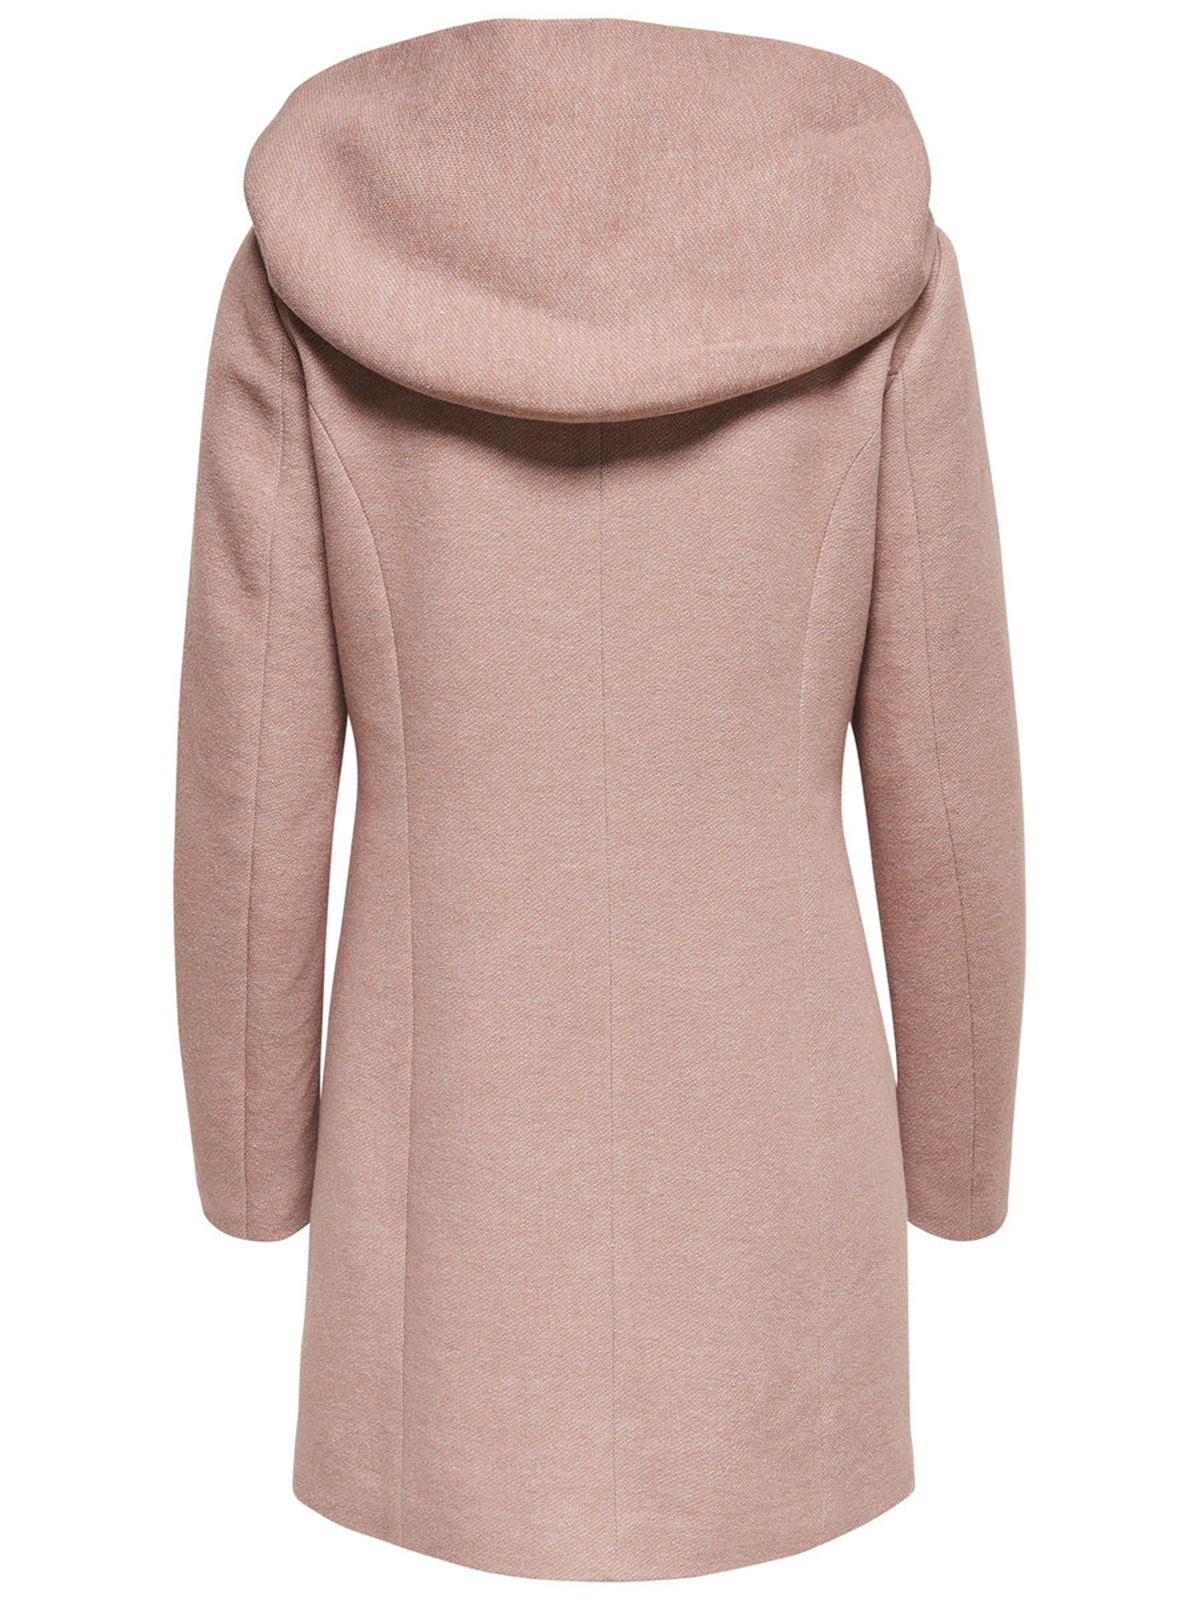 timeless design 8b748 7d757 Only Damen-Woll-Mantel onlSedona Light Coat Otw 15142911